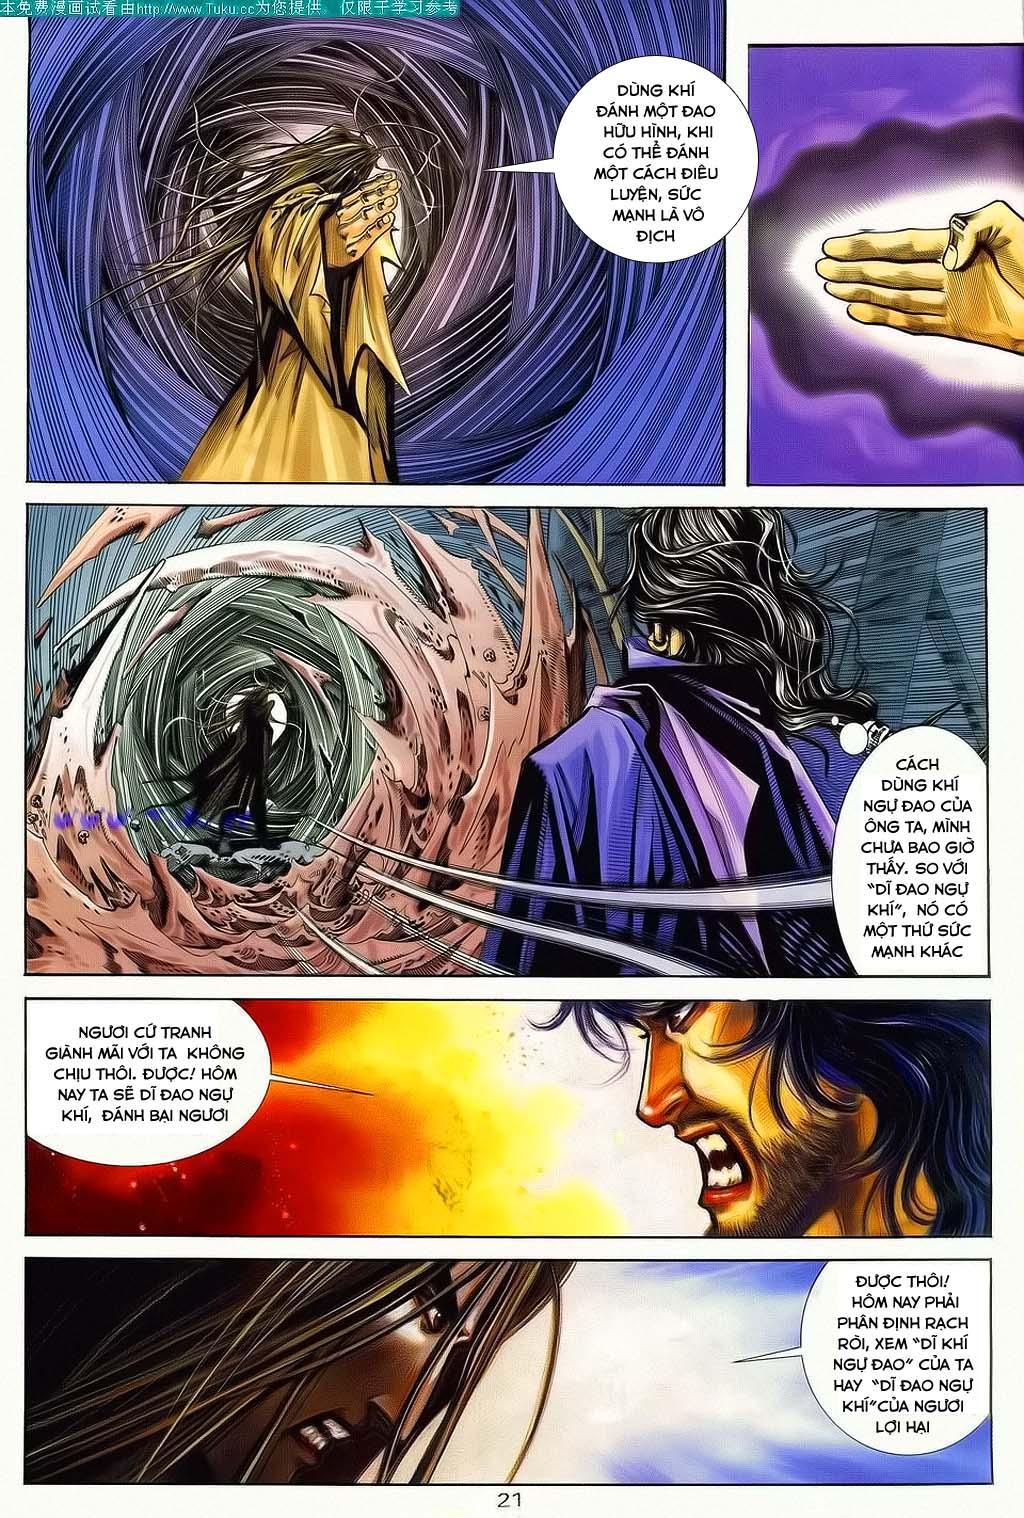 xem truyen moi - Bá Đao - Chapter 123